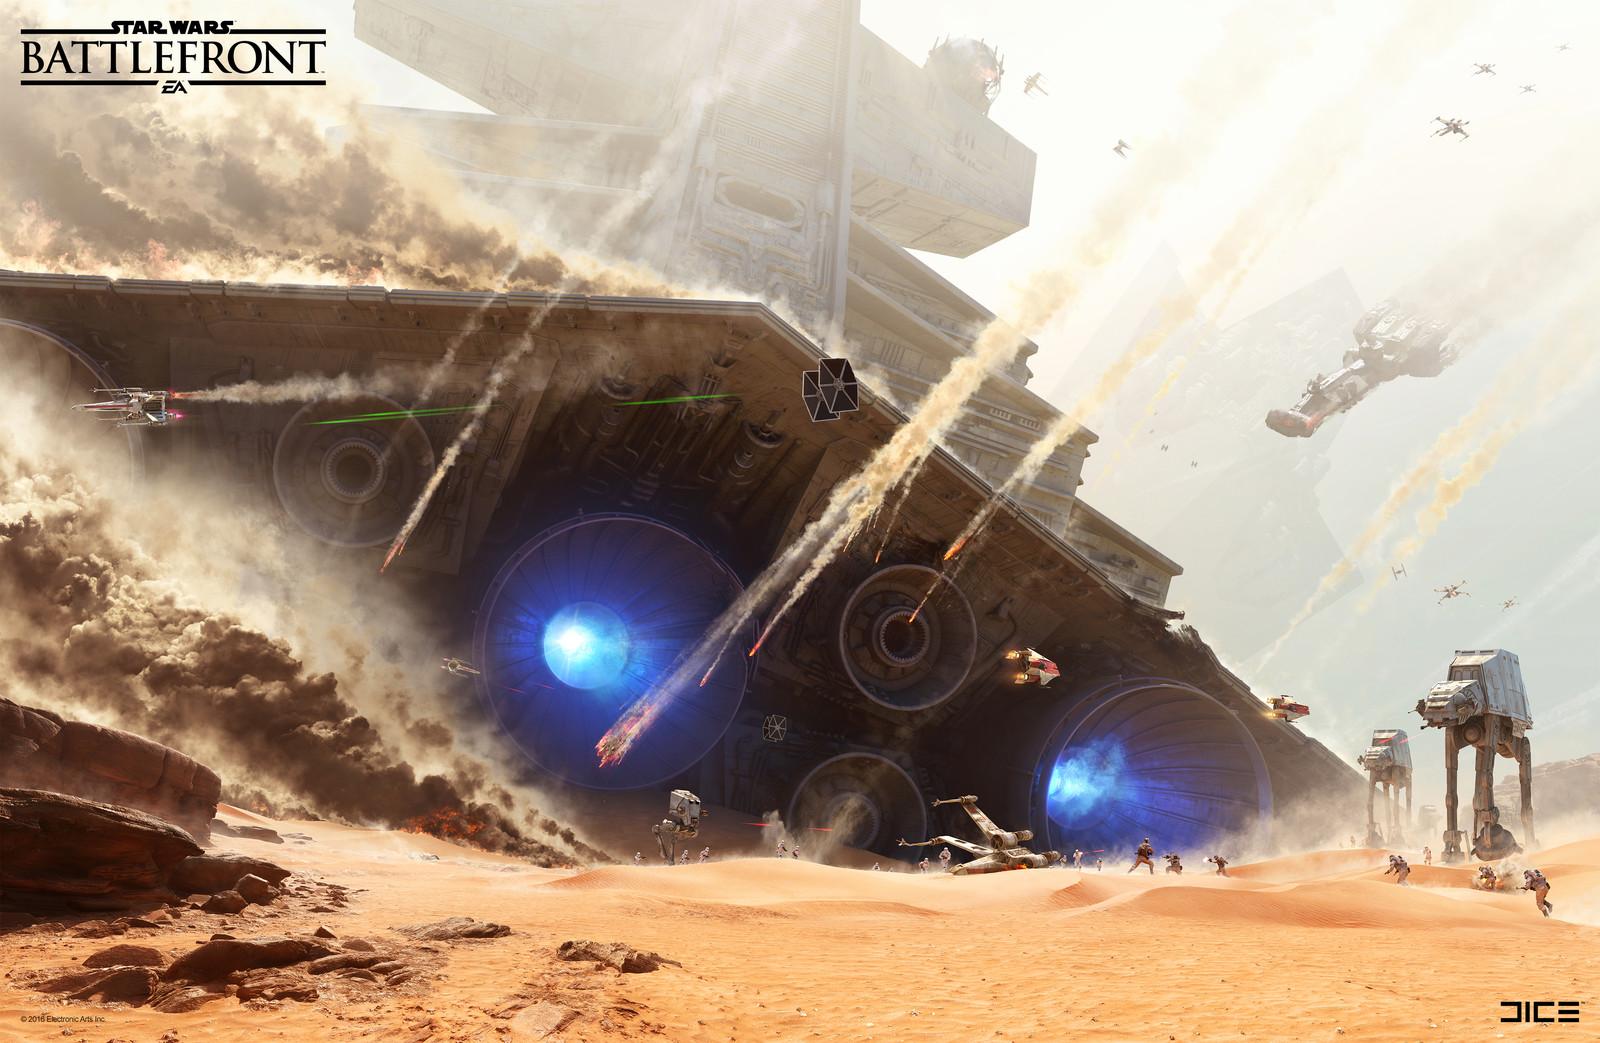 Jakku Key Art for the 2015 Star Wars Battlefront game. (2015)